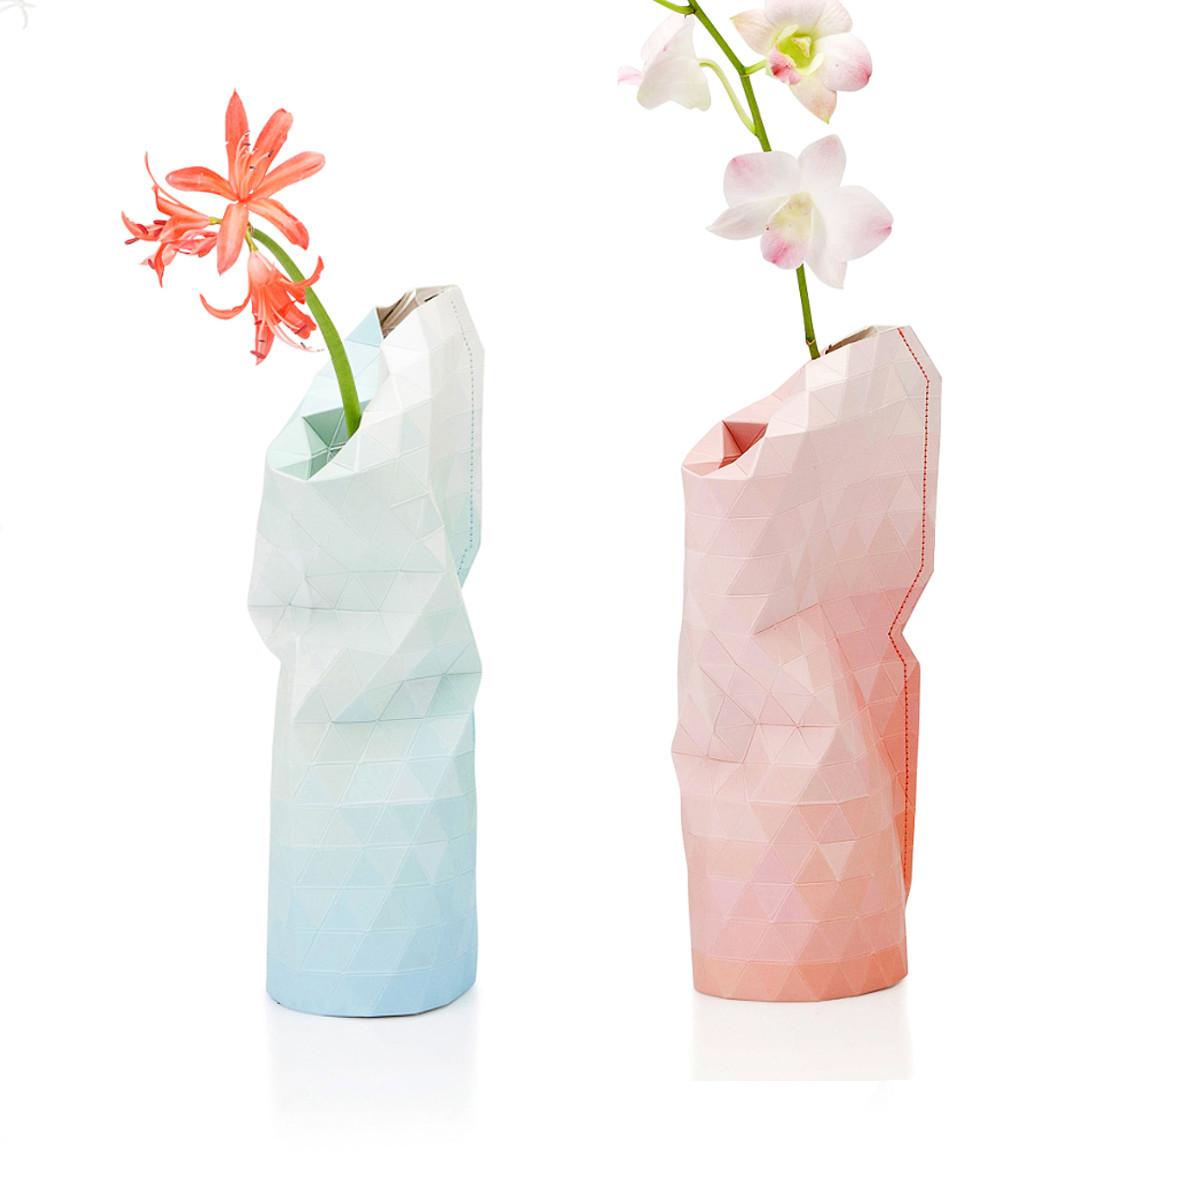 Die Vase, die Gutes tut - klein